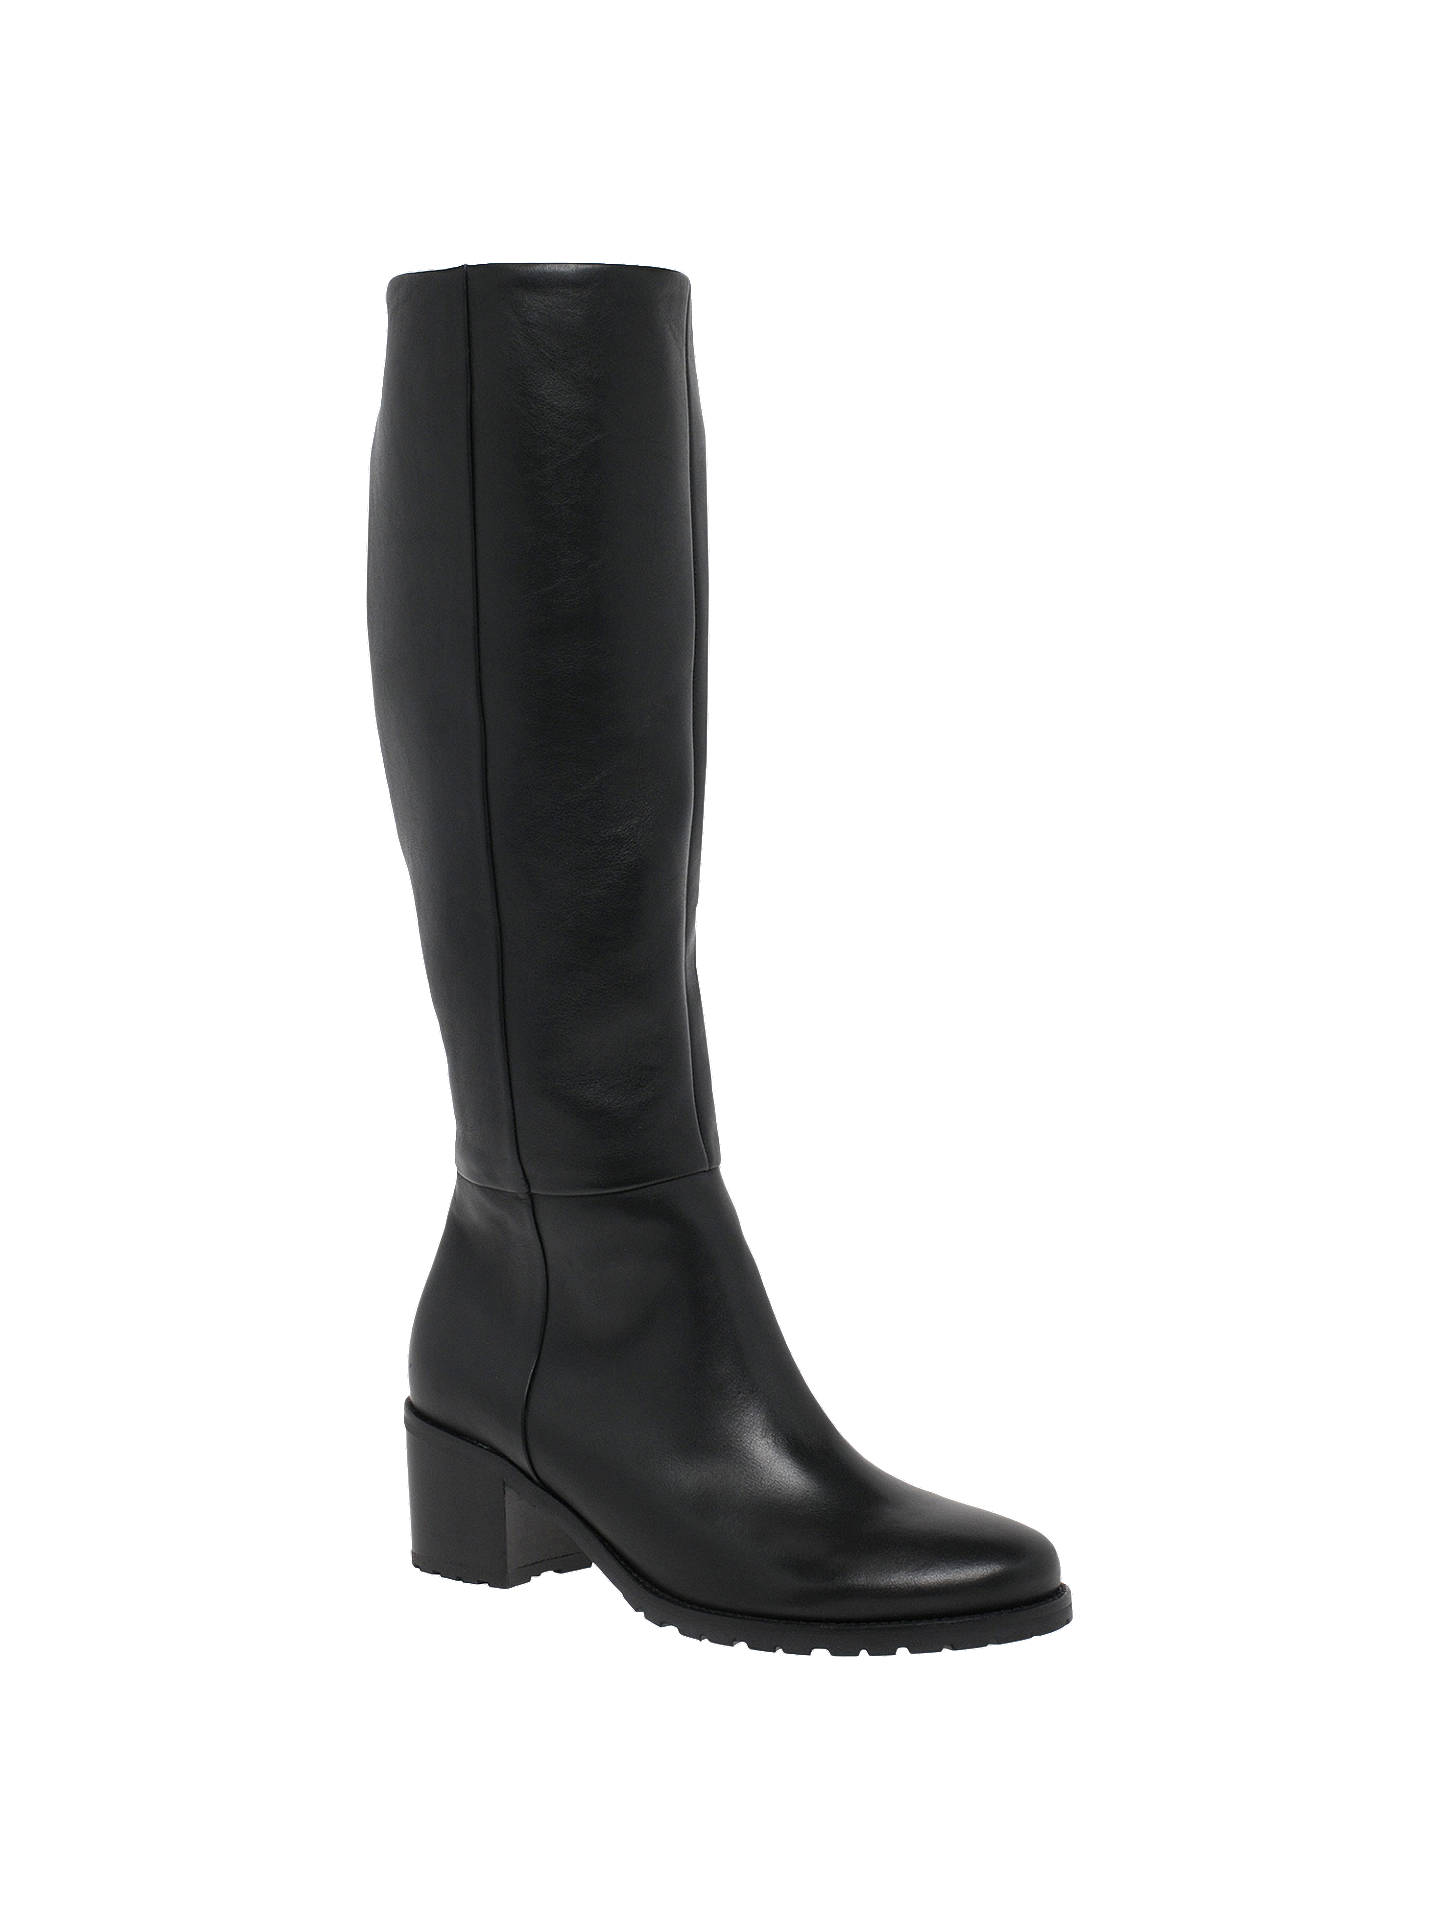 a4917d45860 Buy Gabor Missouri Wide Fit Block Heel Knee High Boots